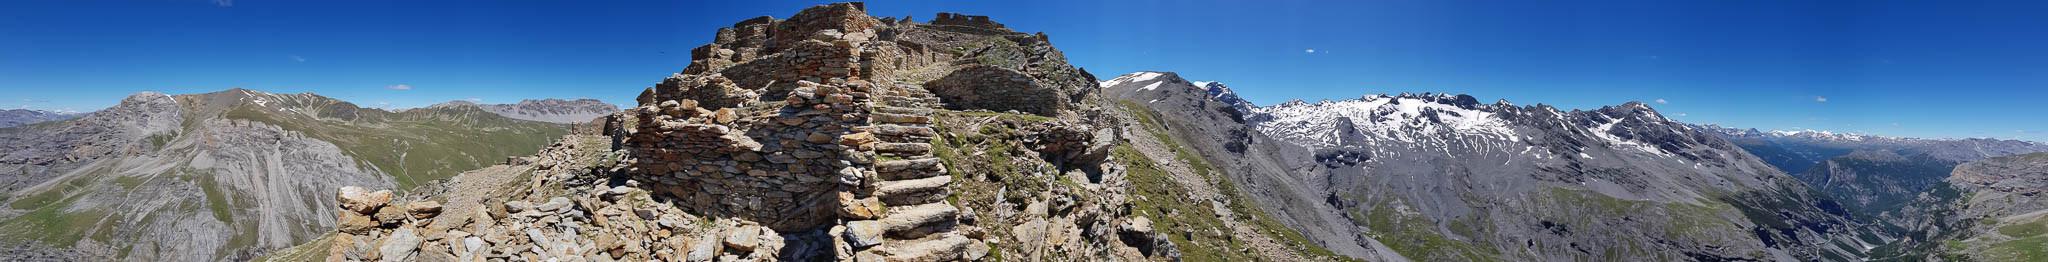 Machu Picchu made by Italy